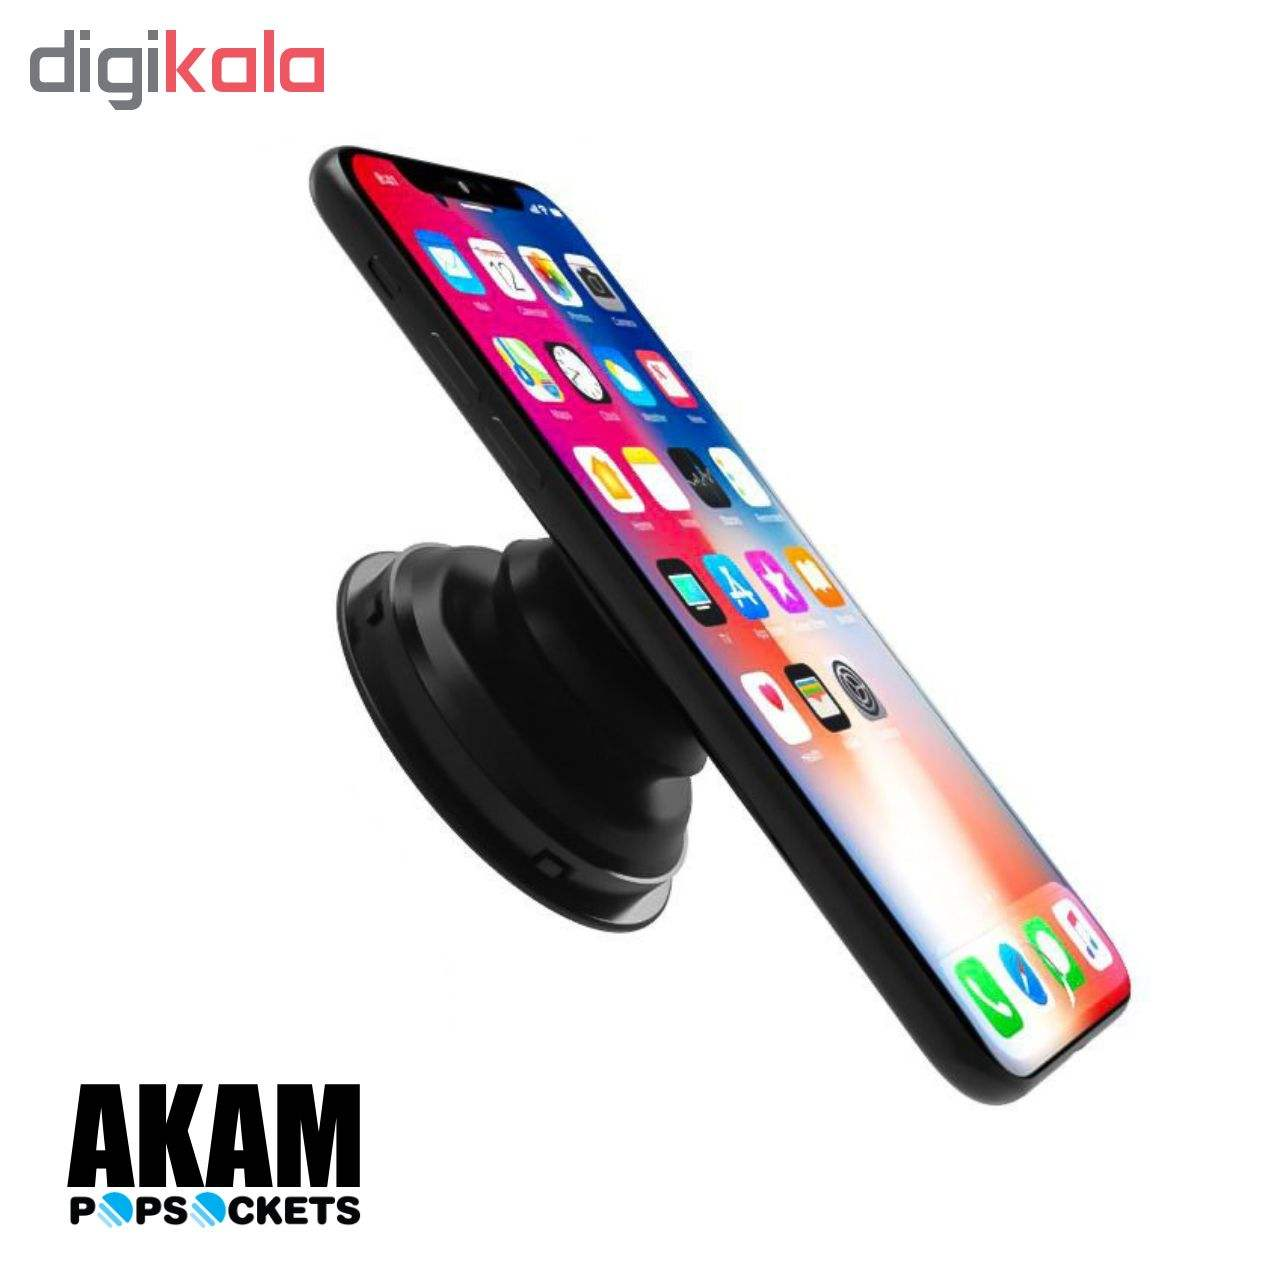 پایه نگهدارنده گوشی موبایل پاپ سوکت آکام مدل APS0191 main 1 6